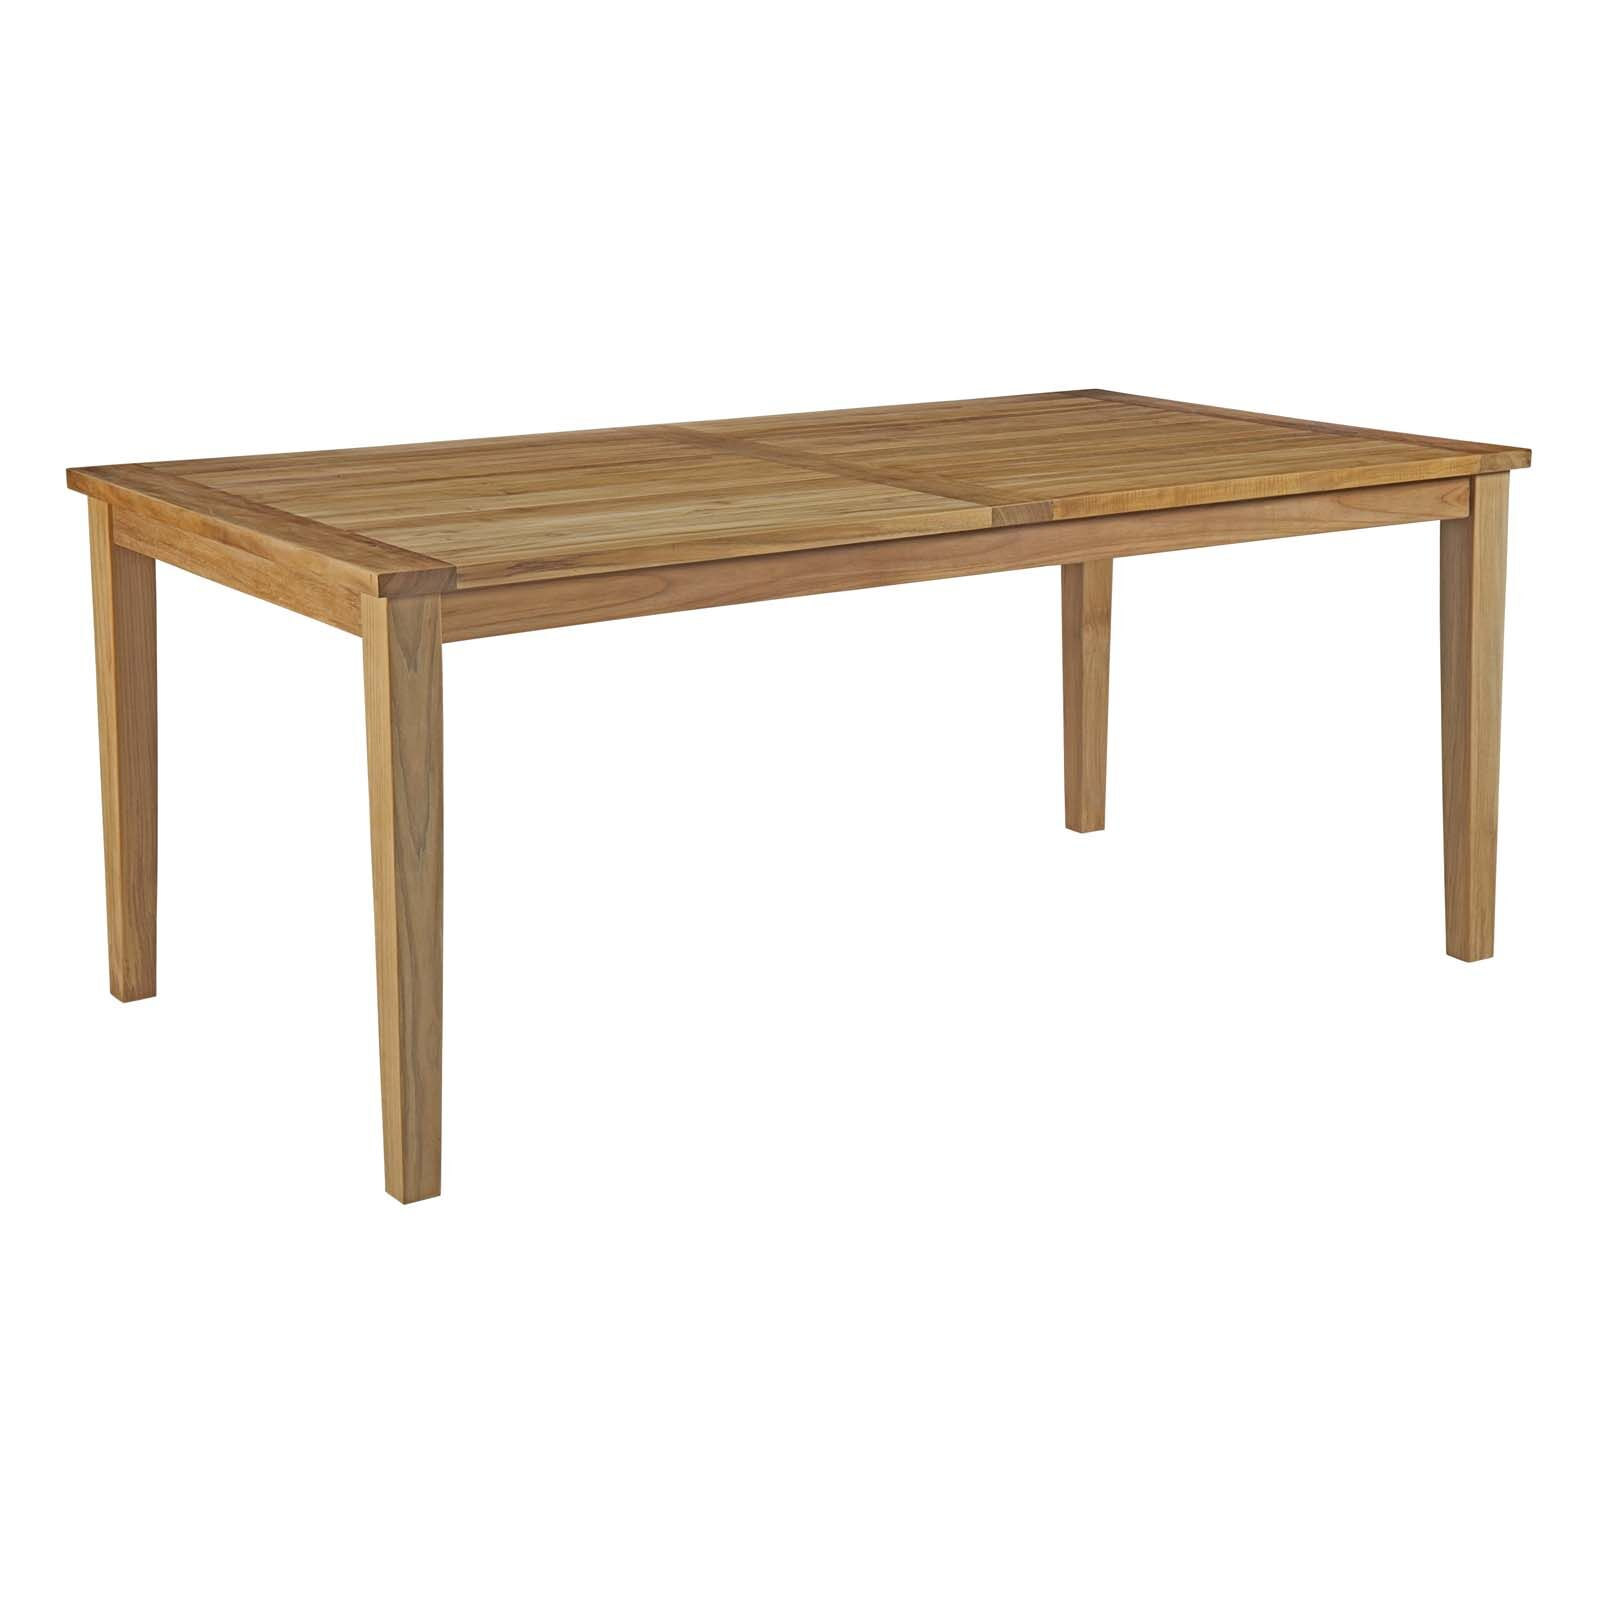 Elaina Outdoor Patio Teak Dining Table Size: 30.5